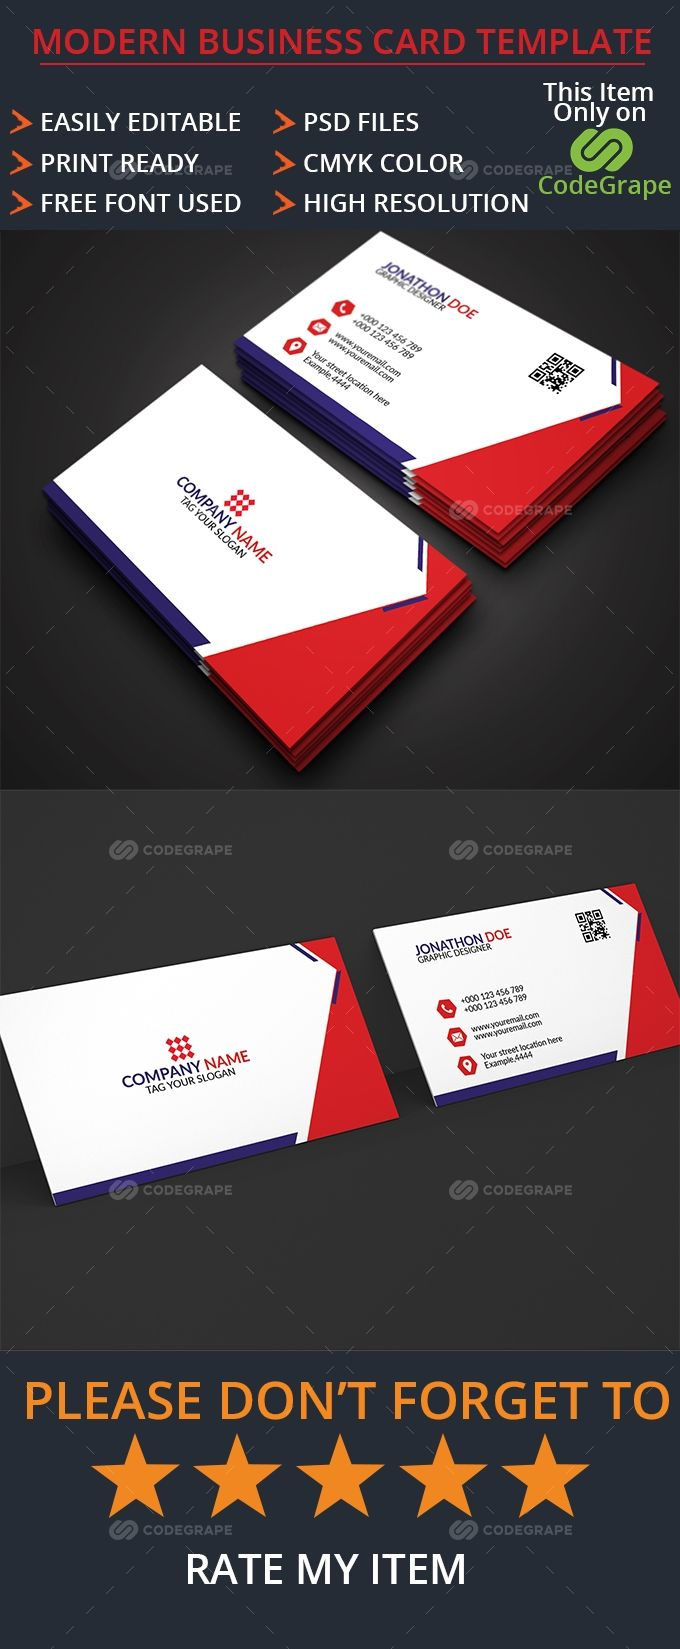 Modern Business Card In 2020 Modern Business Cards Business Card Template Card Template